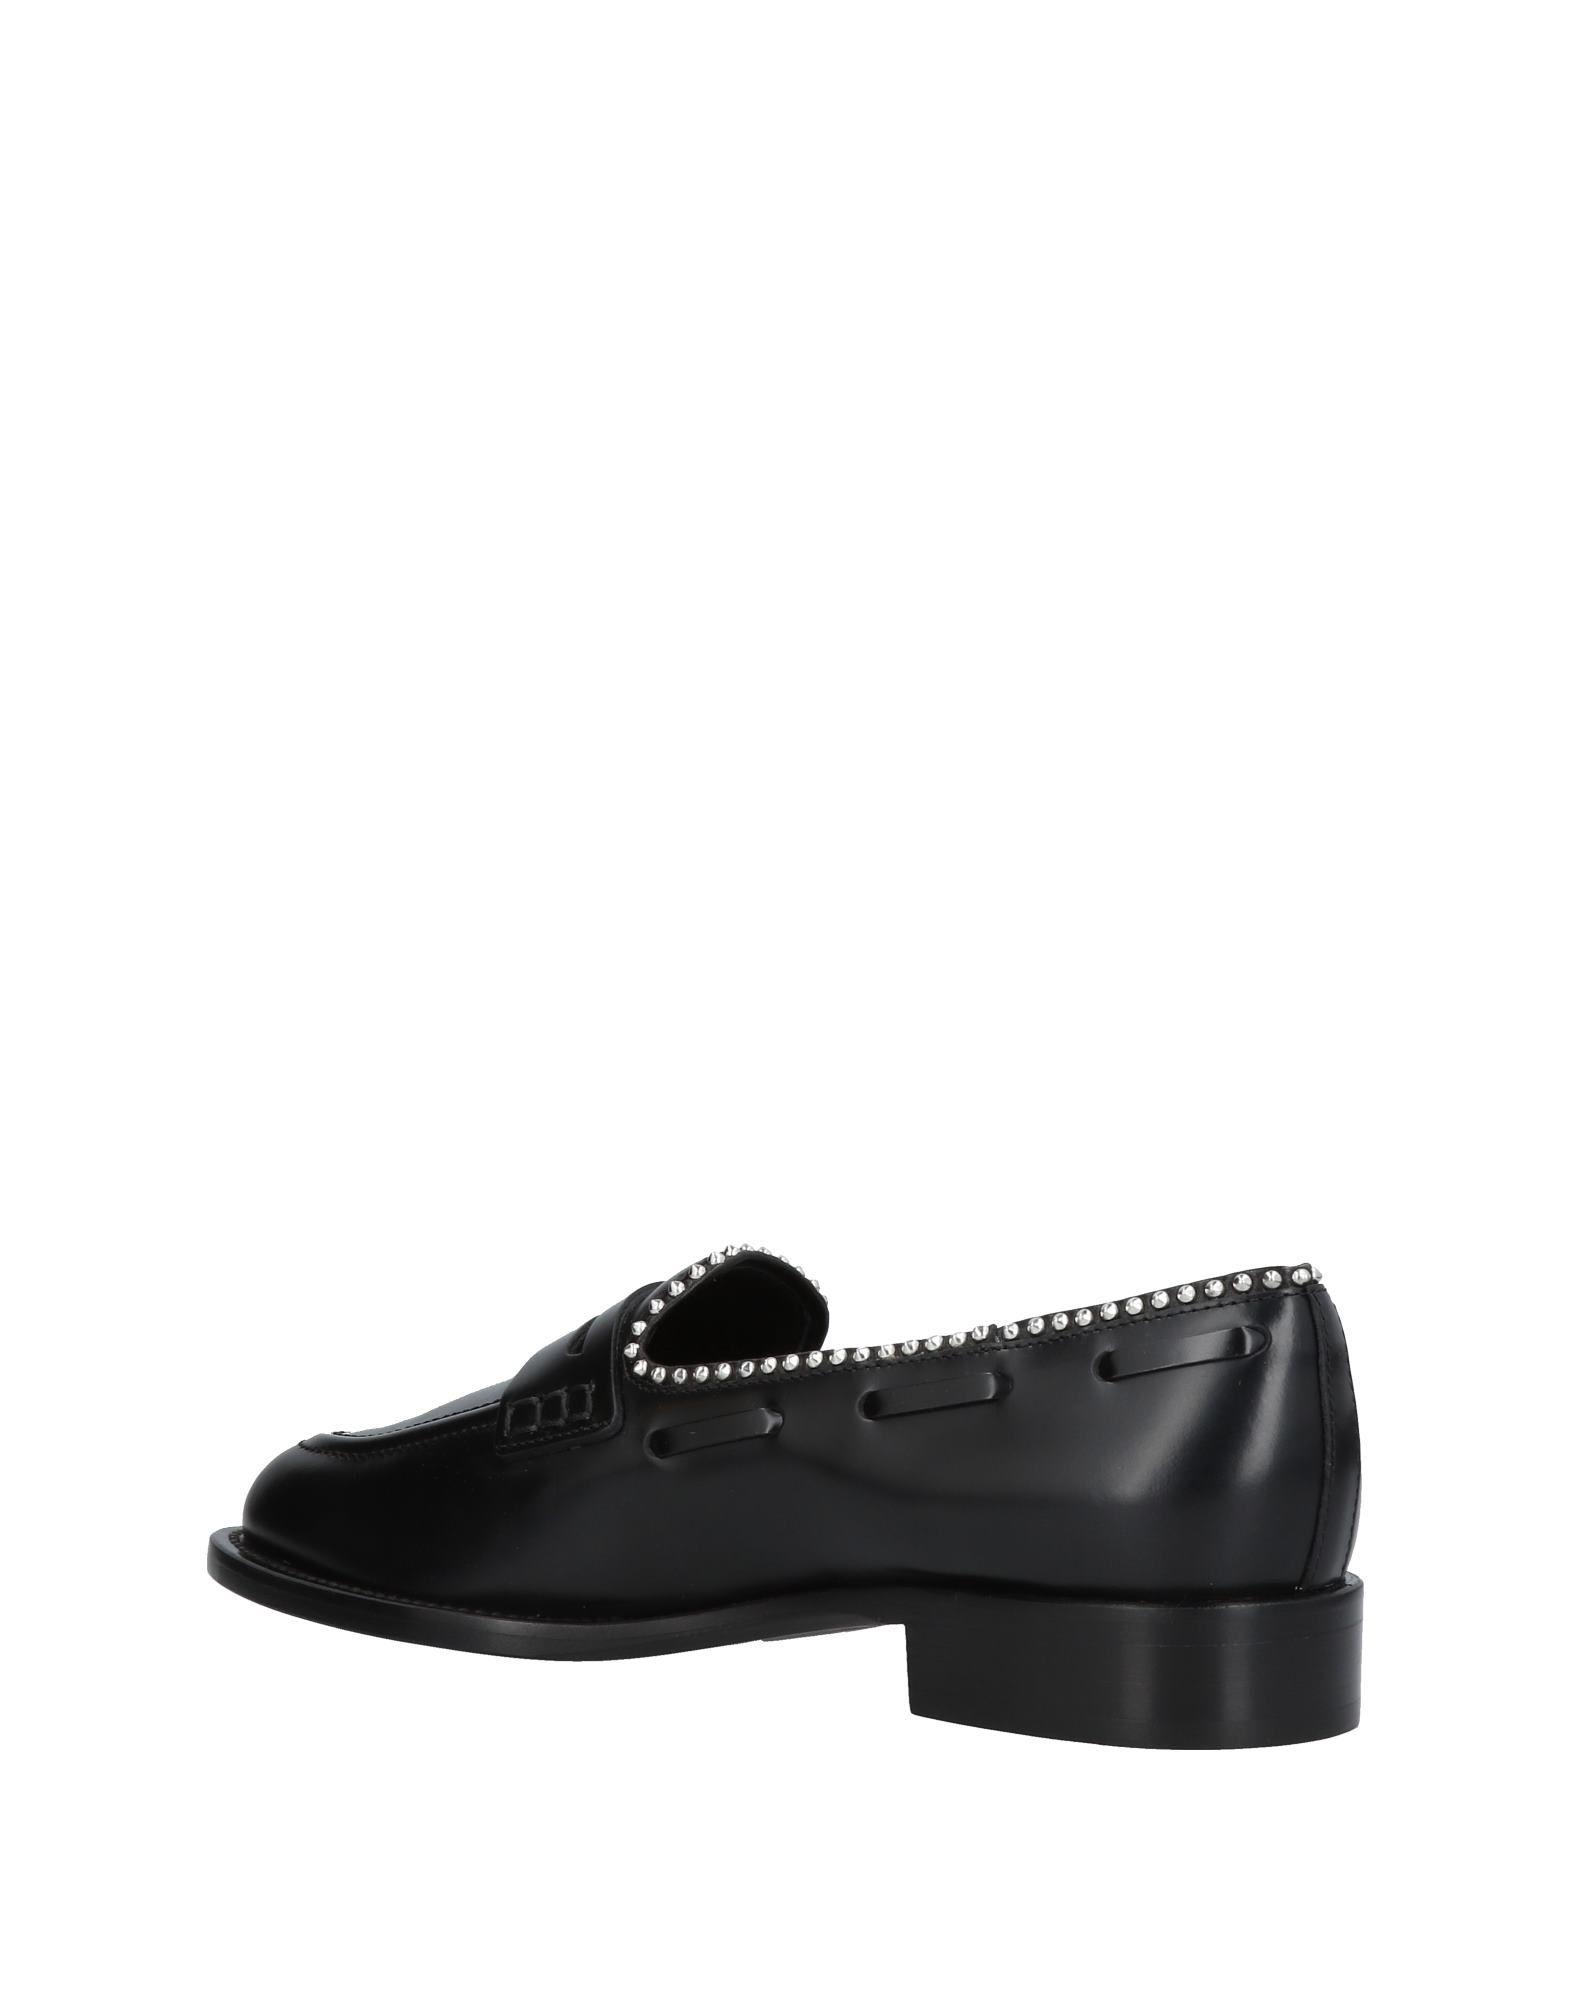 Giuseppe Giuseppe Giuseppe Zanotti Mokassins Damen  11445965QM Beliebte Schuhe cd38a1